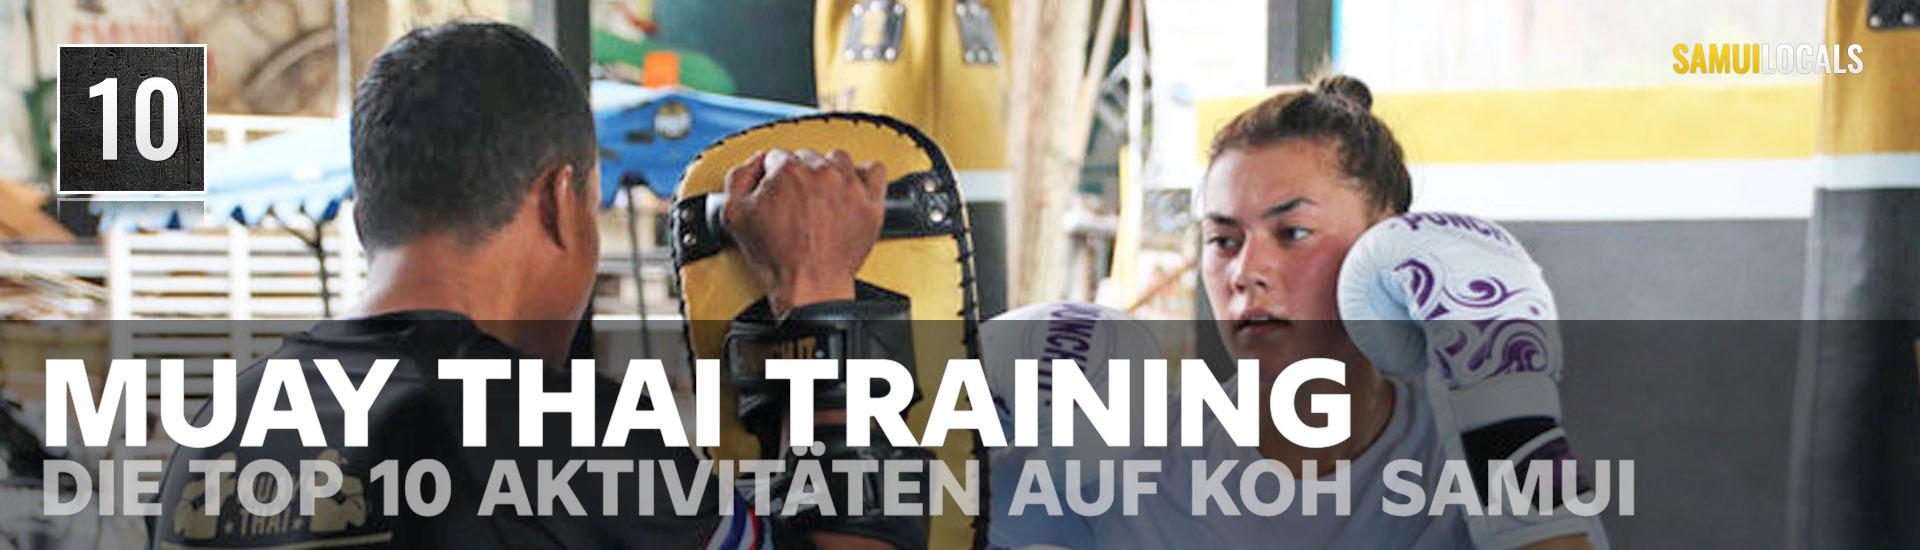 aktivitaeten_koh_samui_muay_thai_training